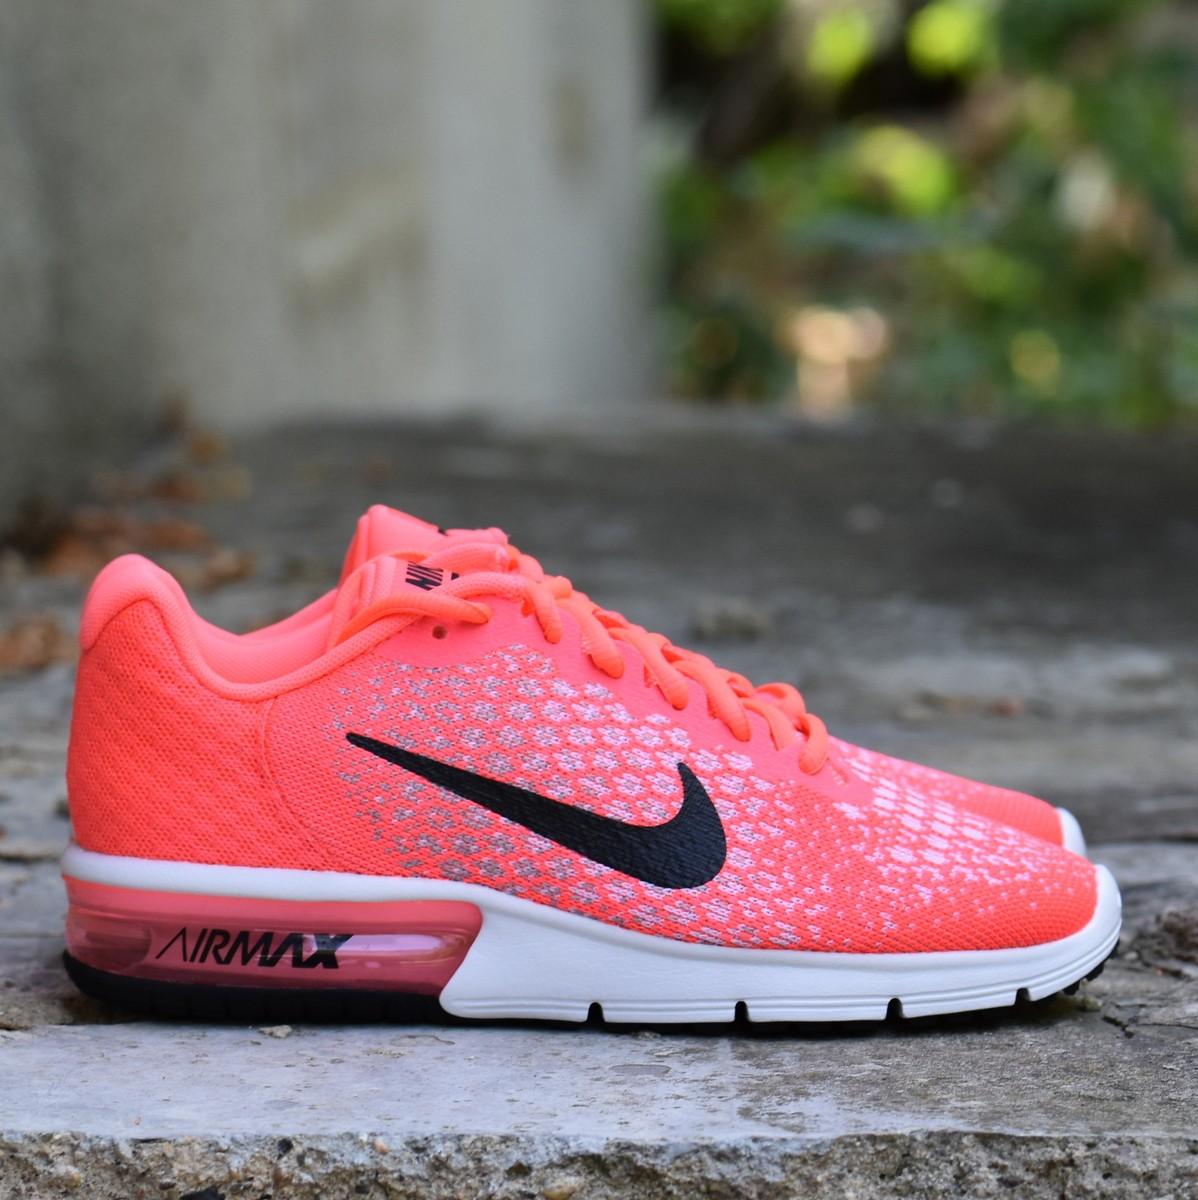 Nike WMNS AIR MAX SEQUENT 2 Dámské boty EU 37.5 852465-600 7296804a35